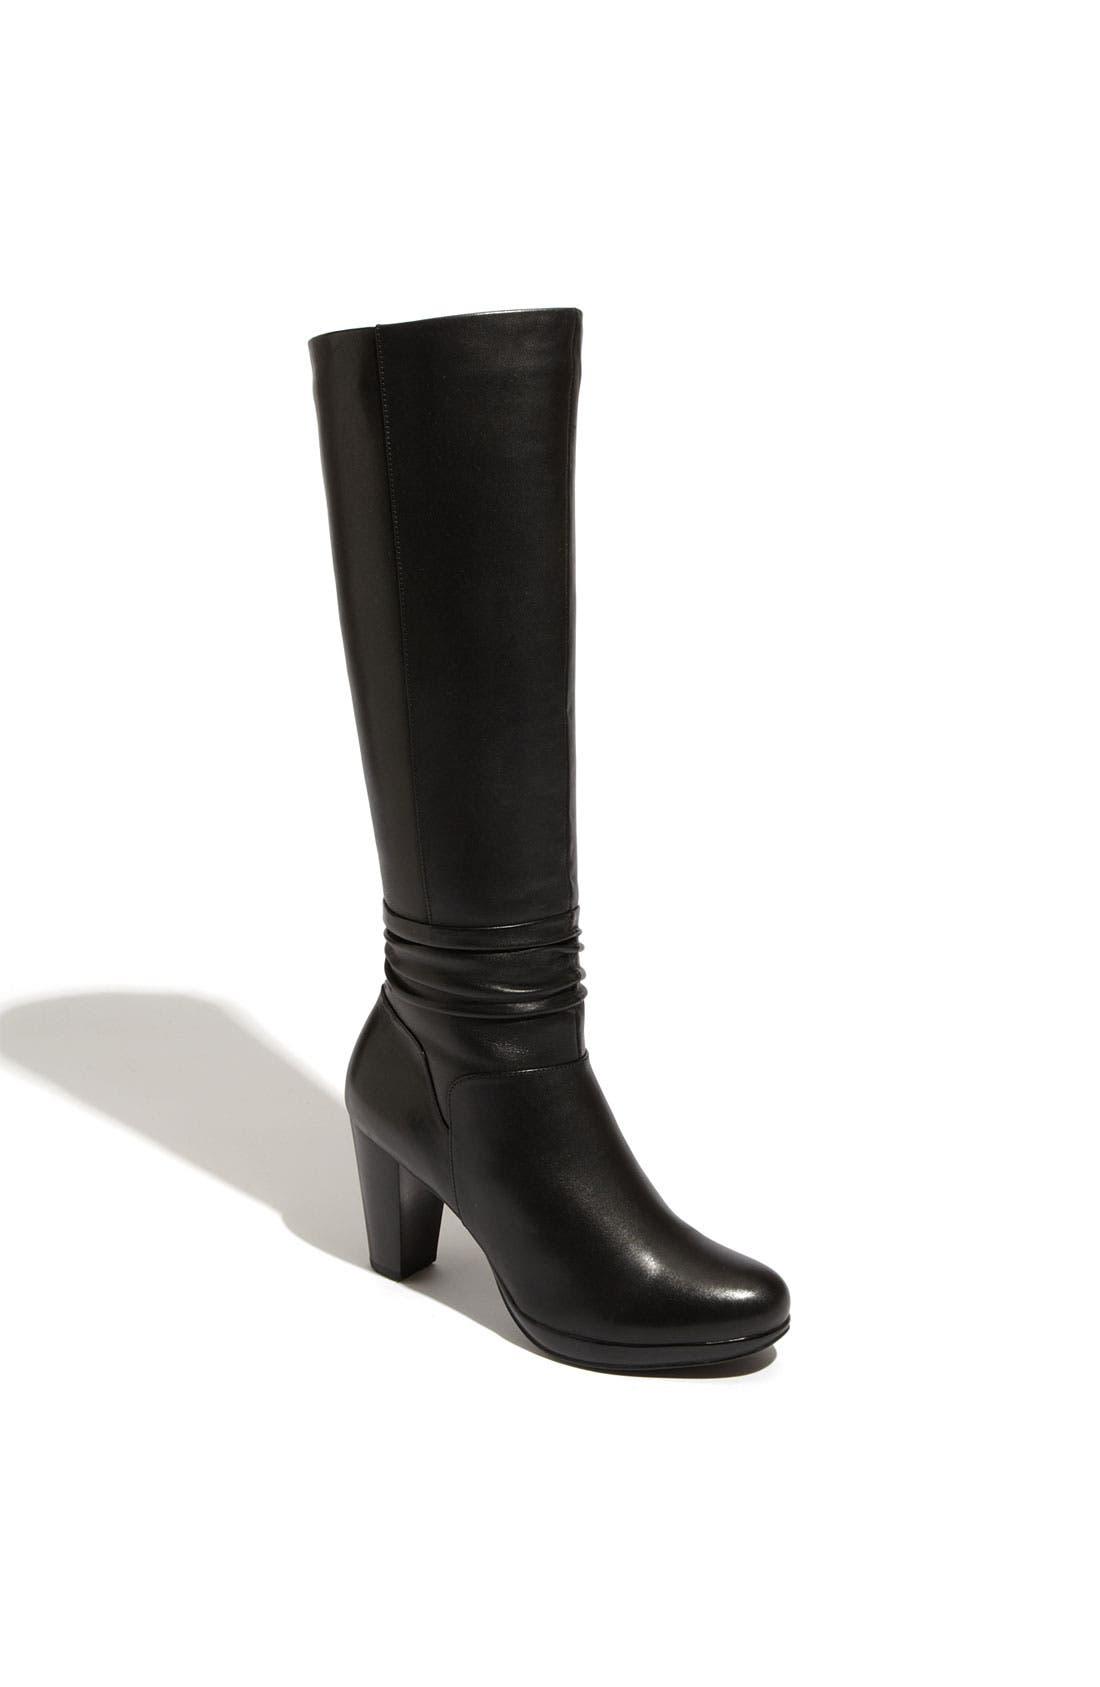 Alternate Image 1 Selected - Blondo 'Pasadena' Boot